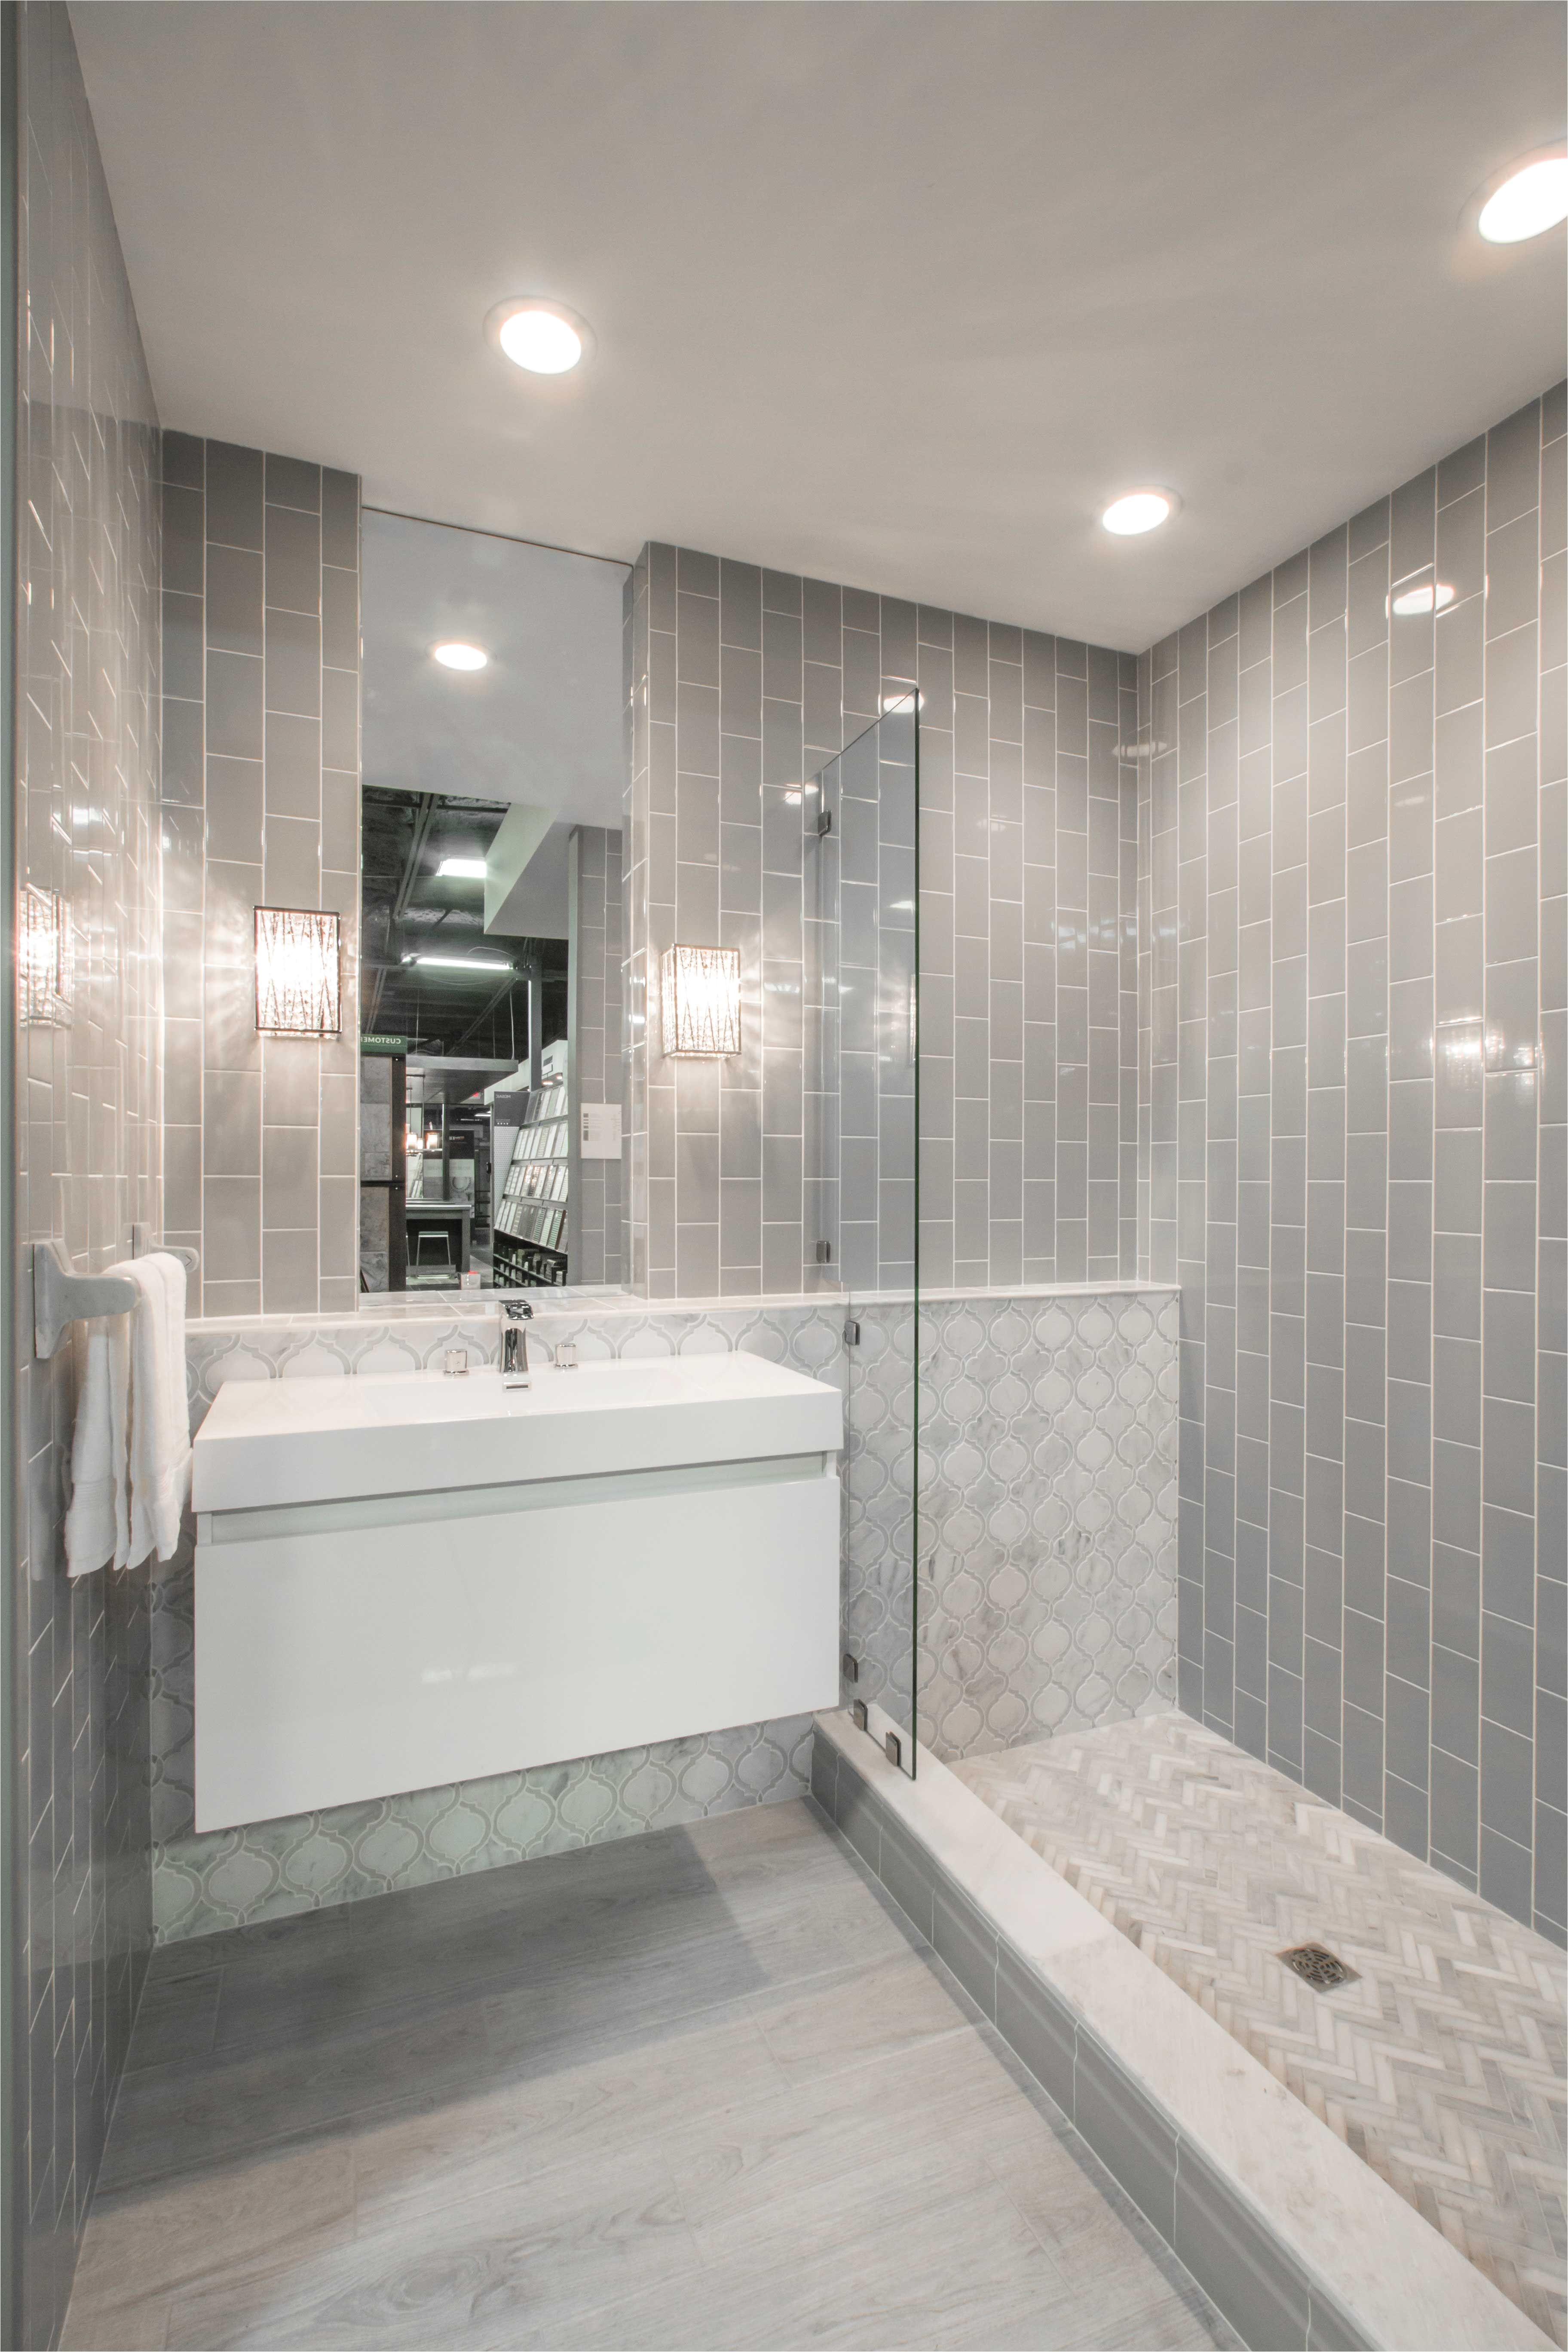 Simple yet elegant bathroom wall tile Imperial Ice Grey Gloss Ceramic Subway Tile s